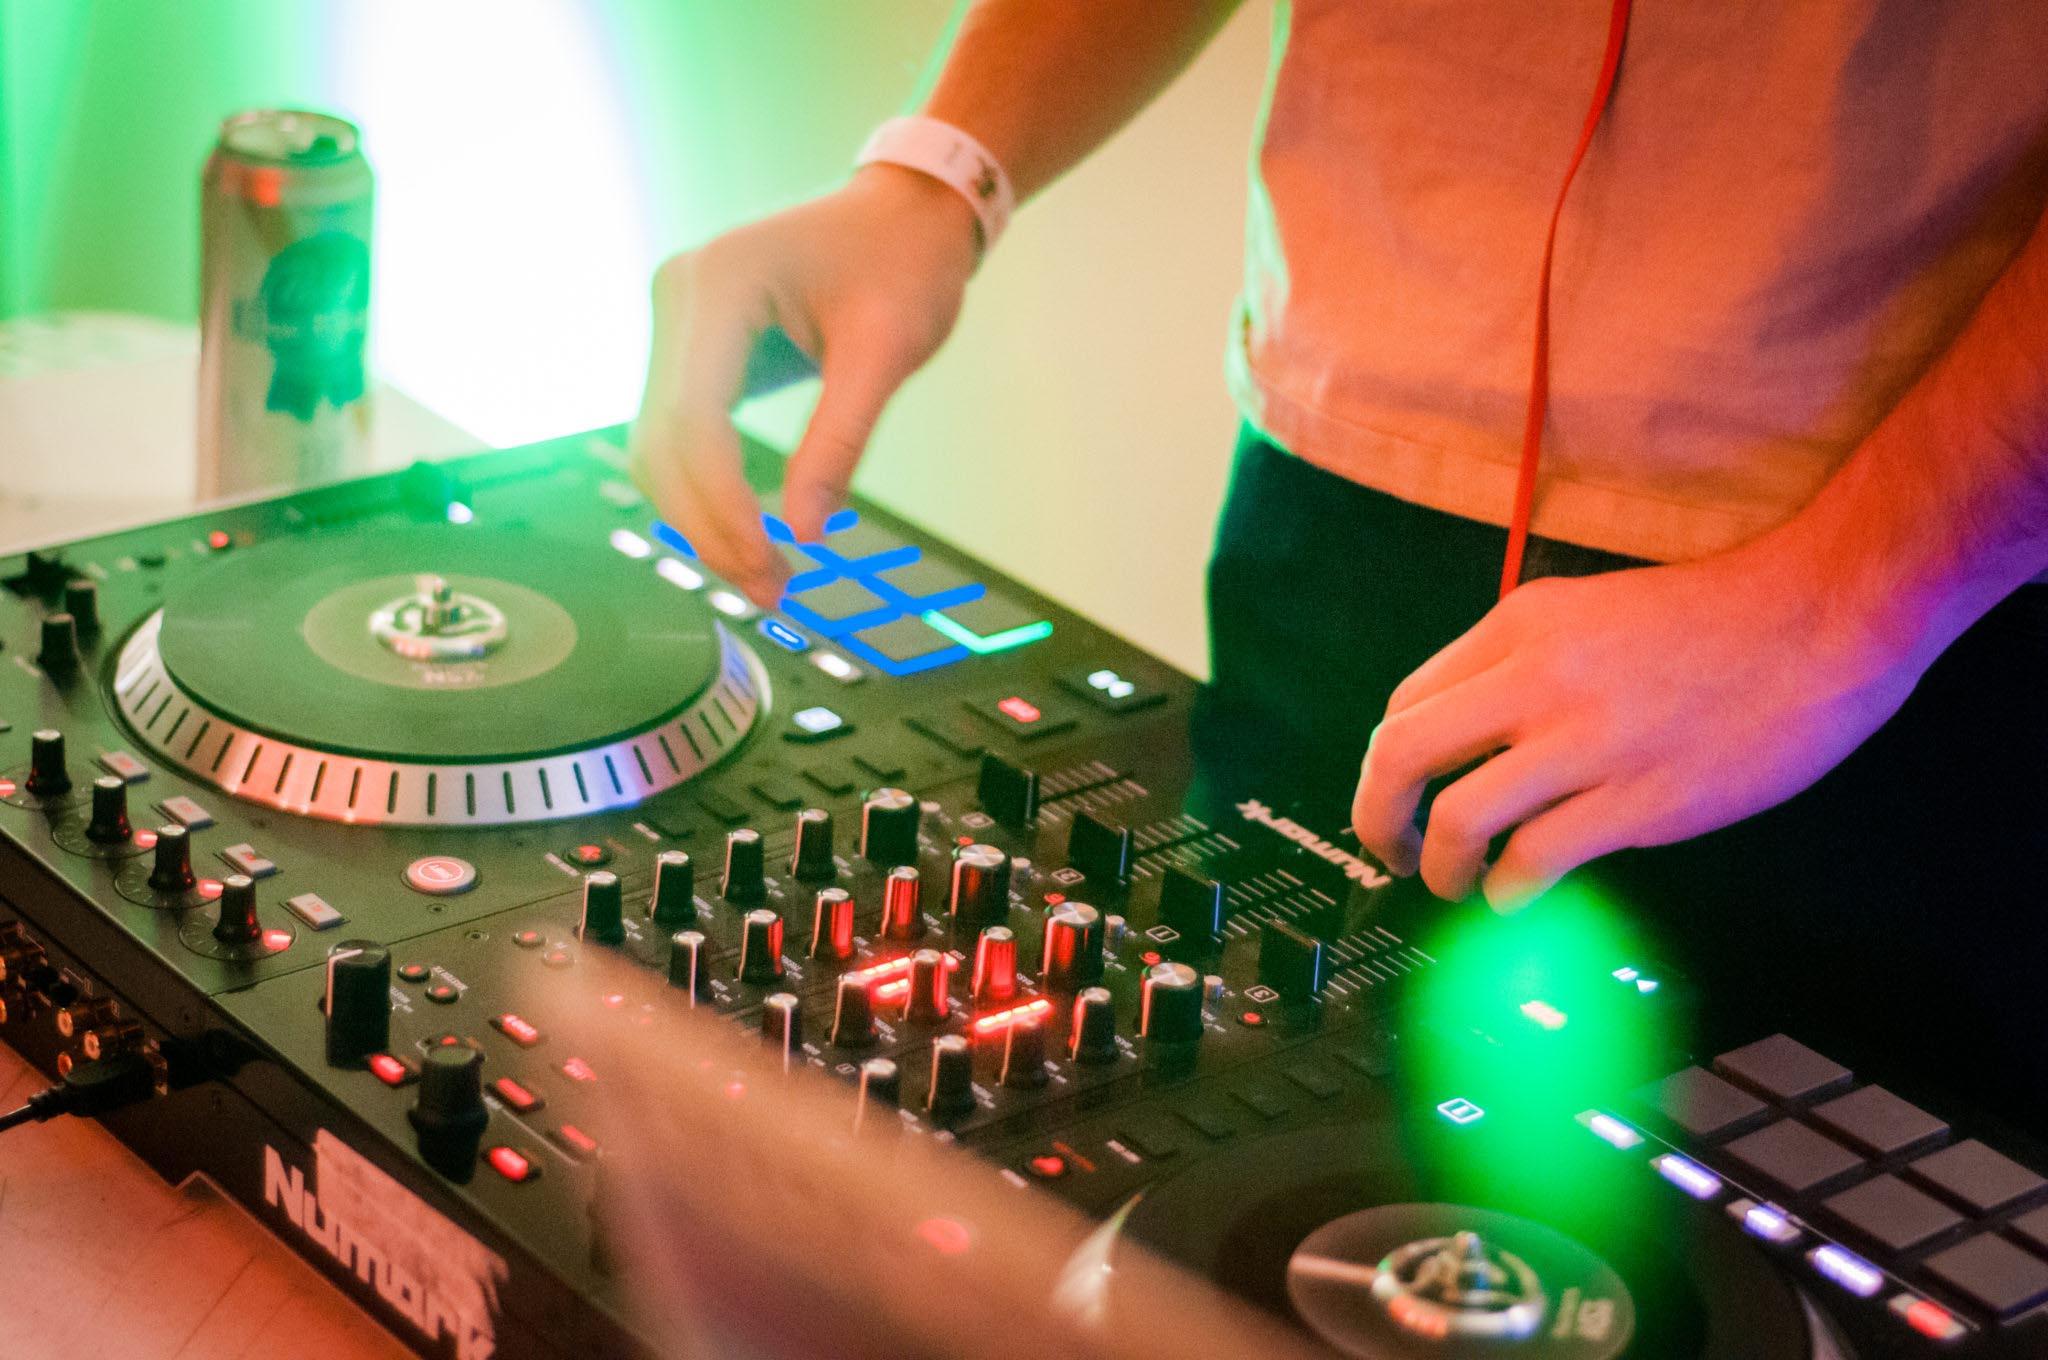 Willy Green DJs at the Colorado Mesa University Art Gallery